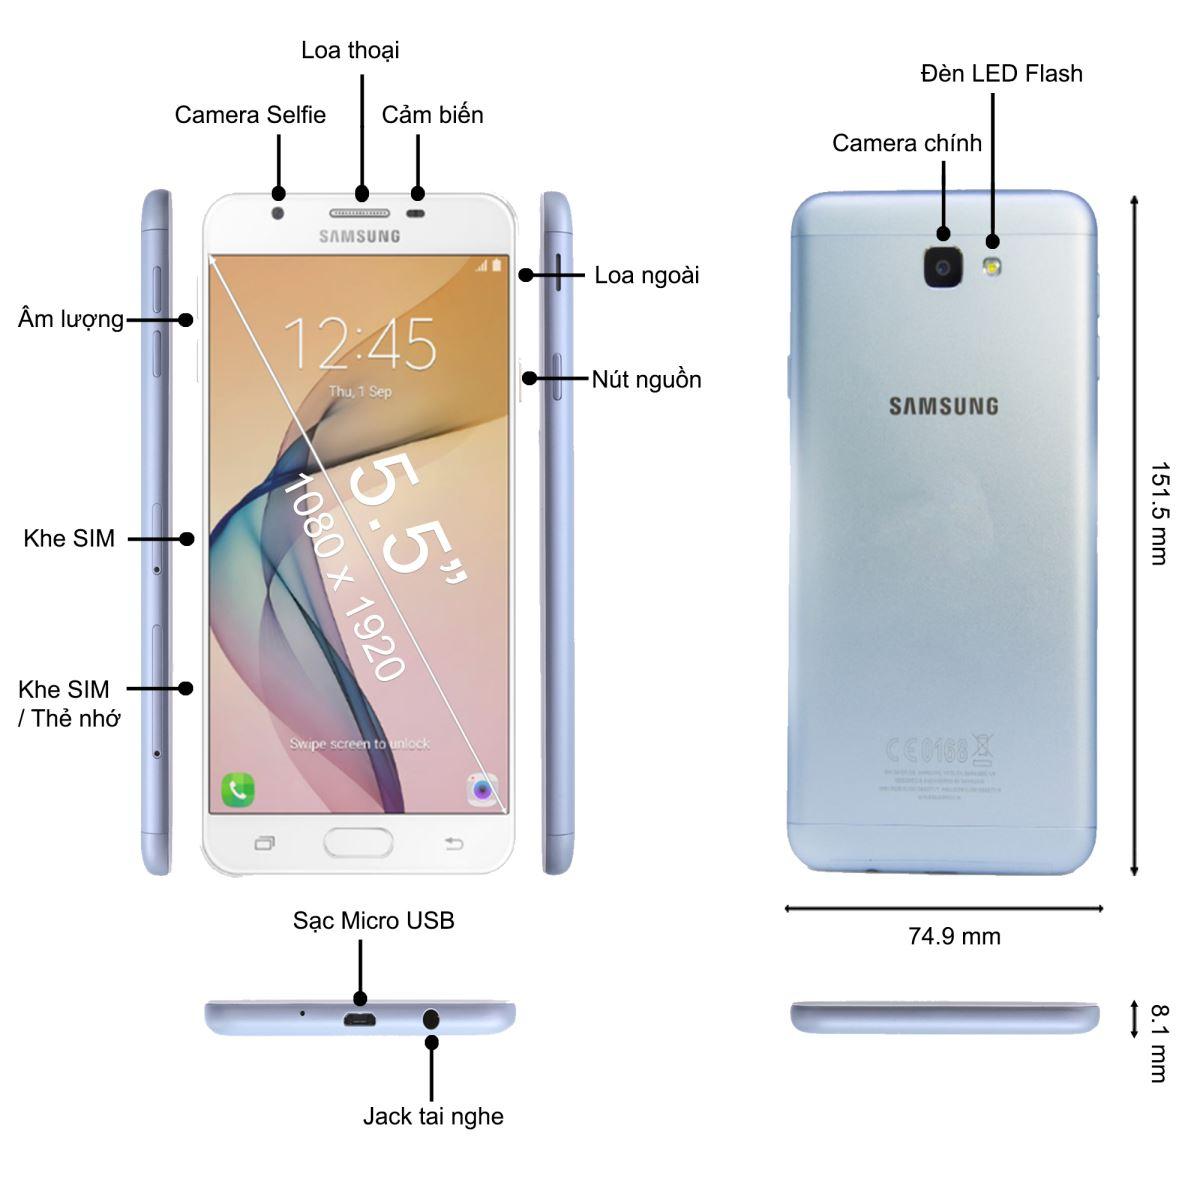 Samsung Galaxy J7 Prime - Giảm giá sốc   Fptshop.com.vn